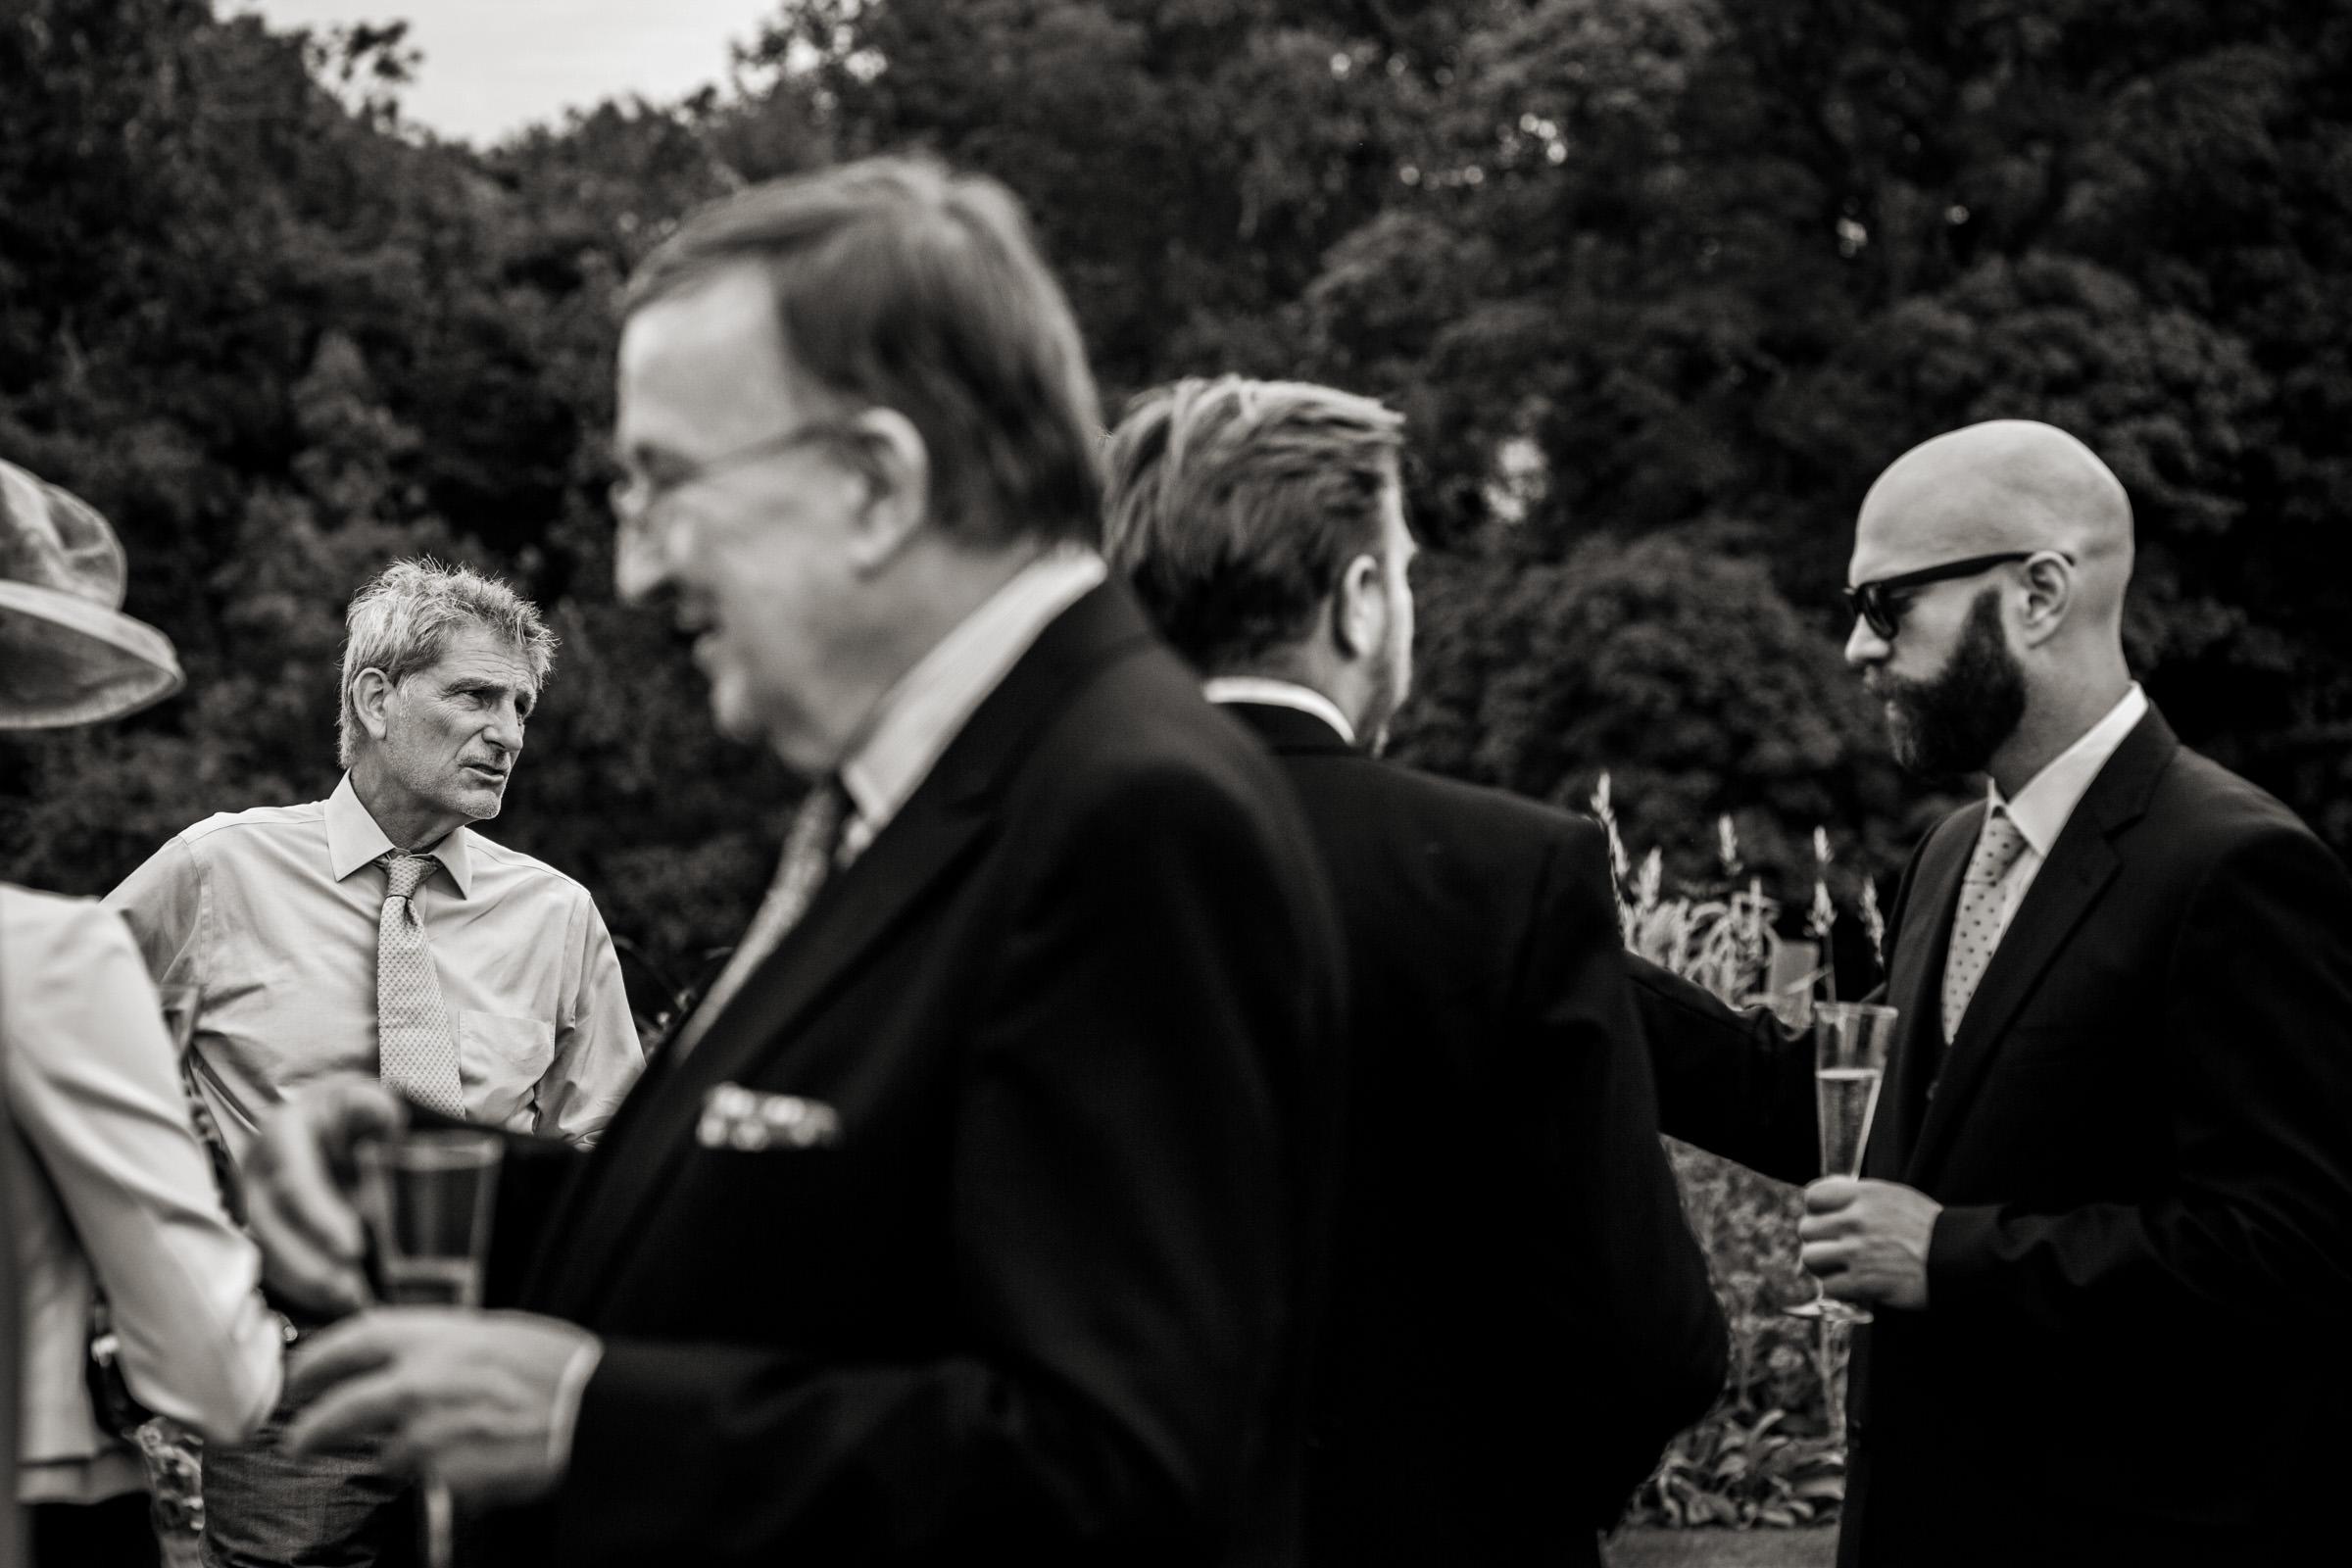 Lincolnshire natural wedding photography 028.jpg